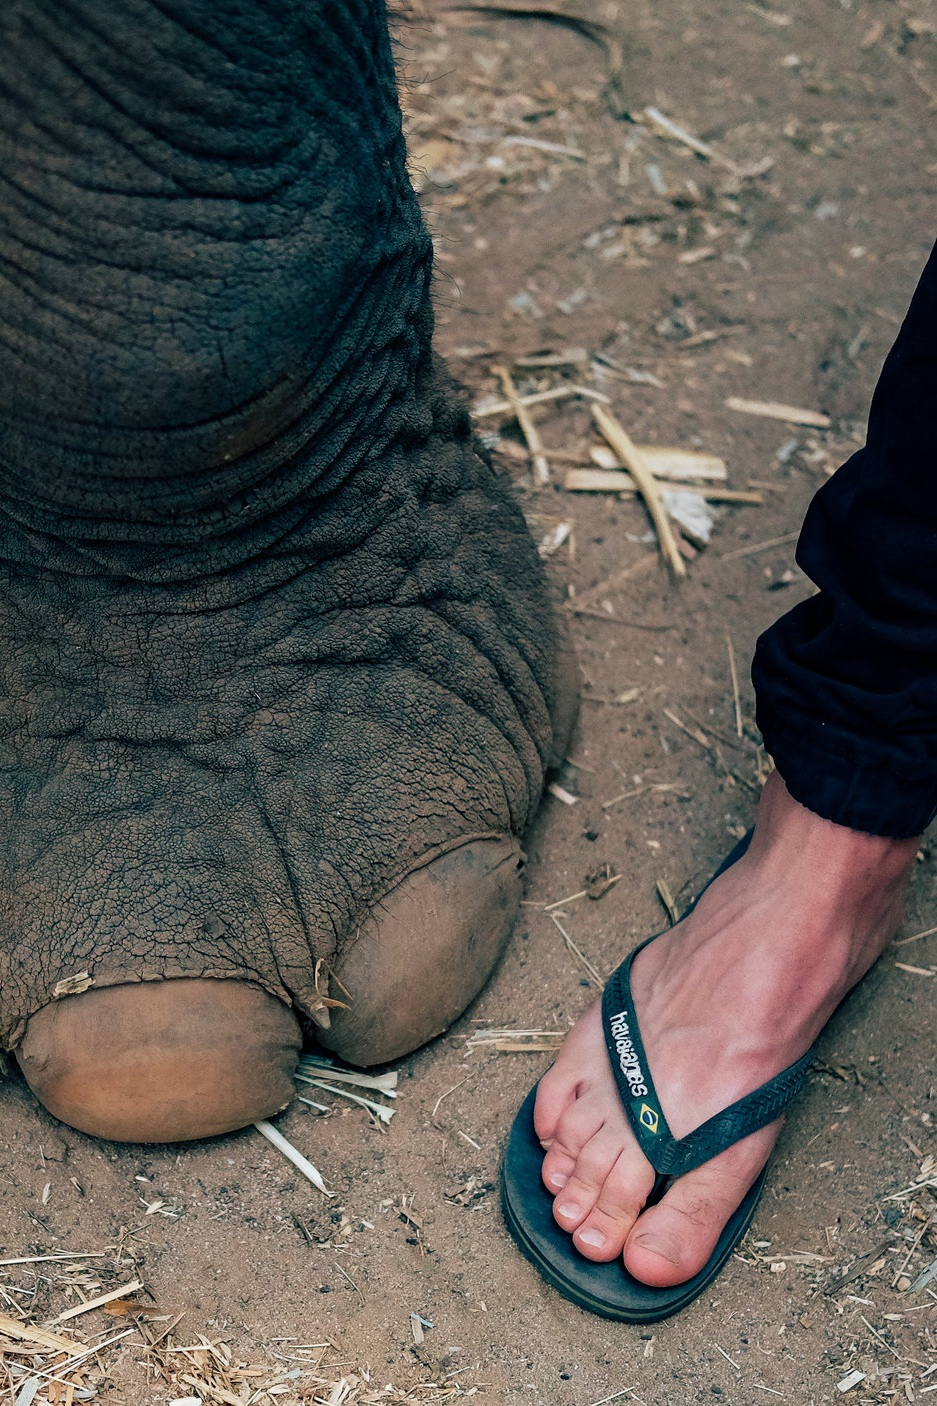 Elephant foot vs. human foot